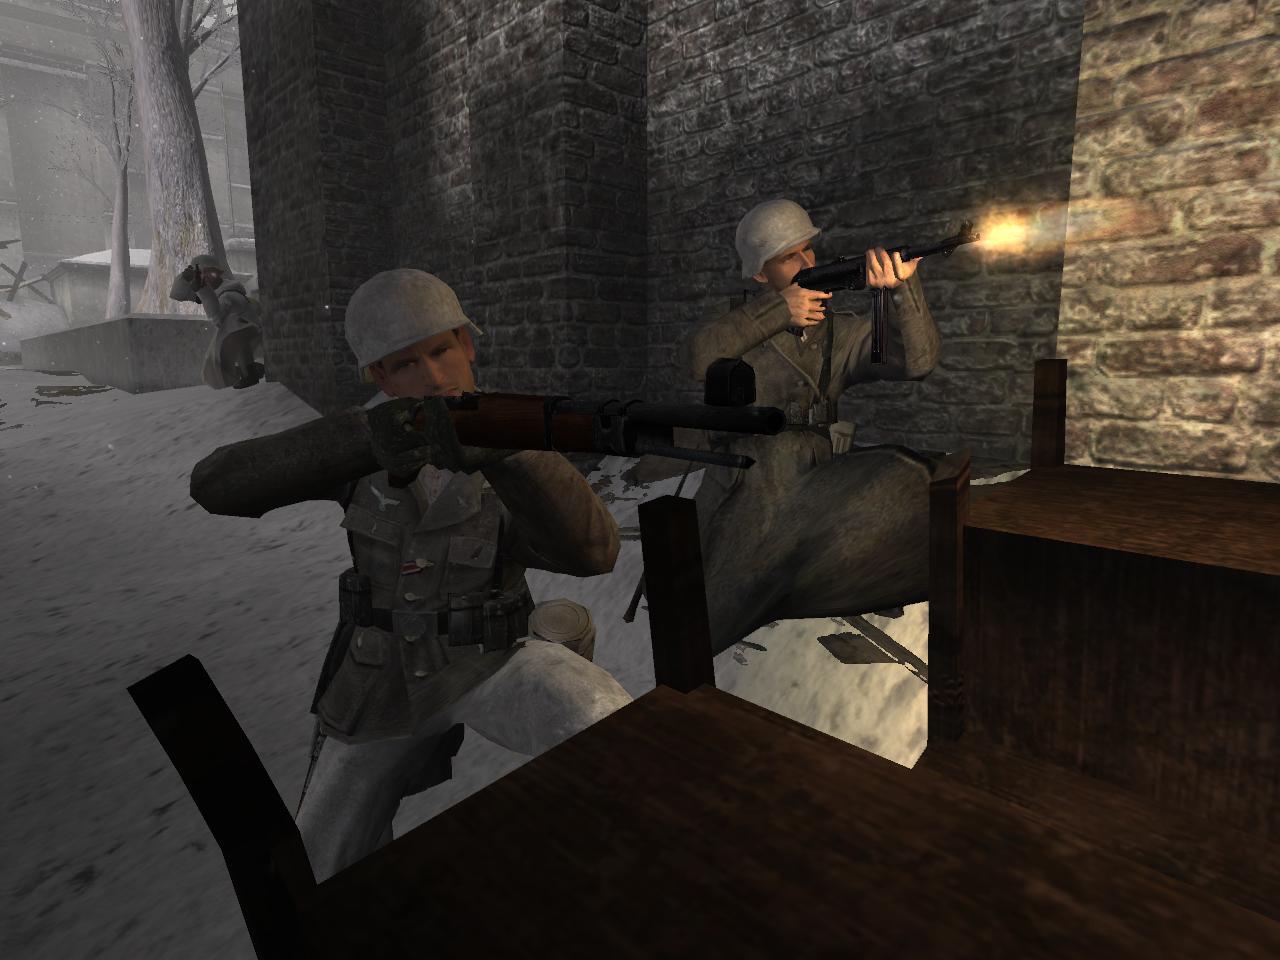 Best Guns Dying Light